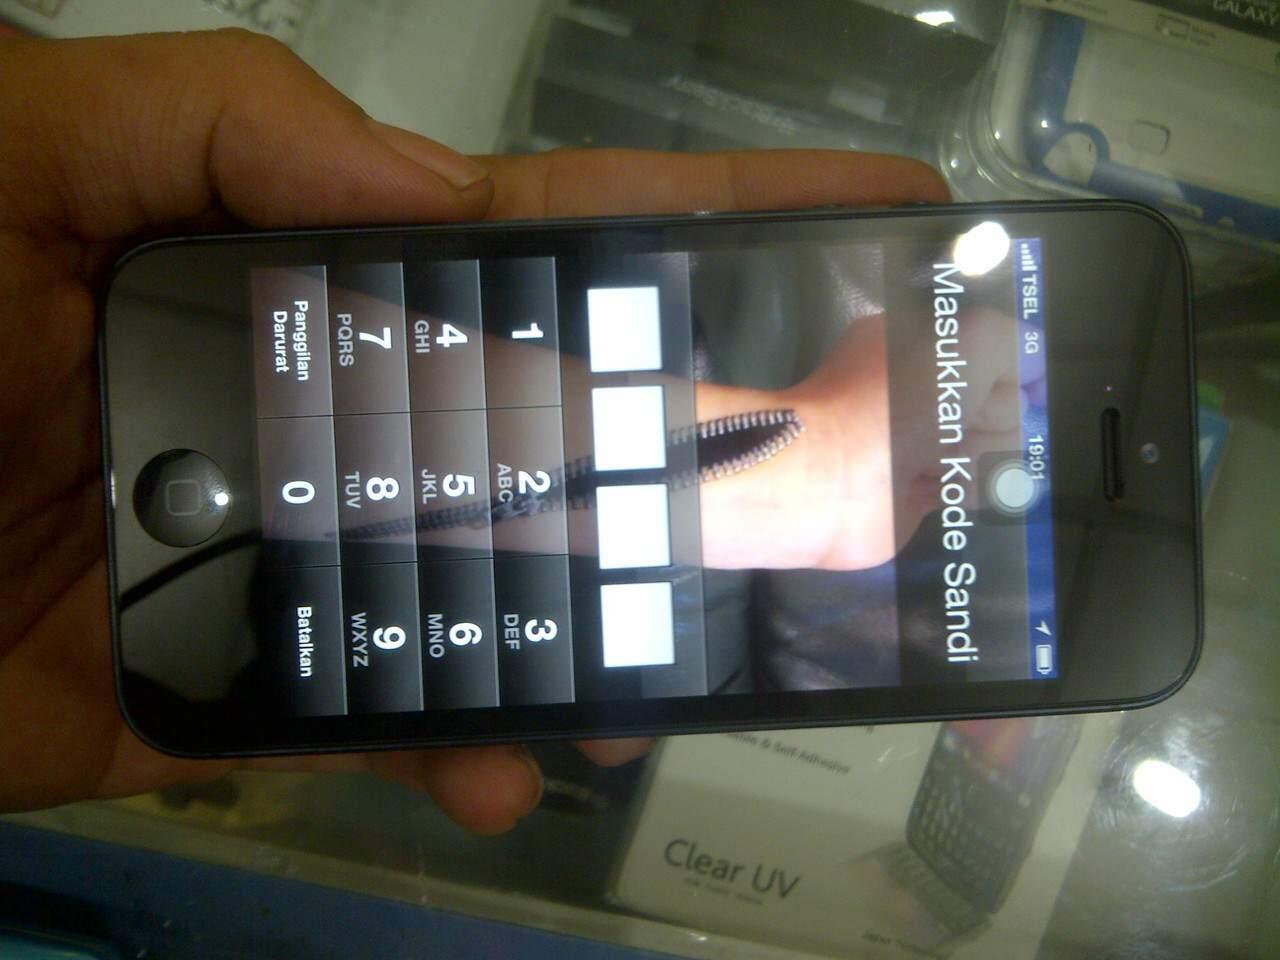 JUAL IPHONE MURAH 5S 16GB SPECIAL HRG Rp 2.100.000 # IPHONE 5 16 GB Rp.1.500.000 .!!